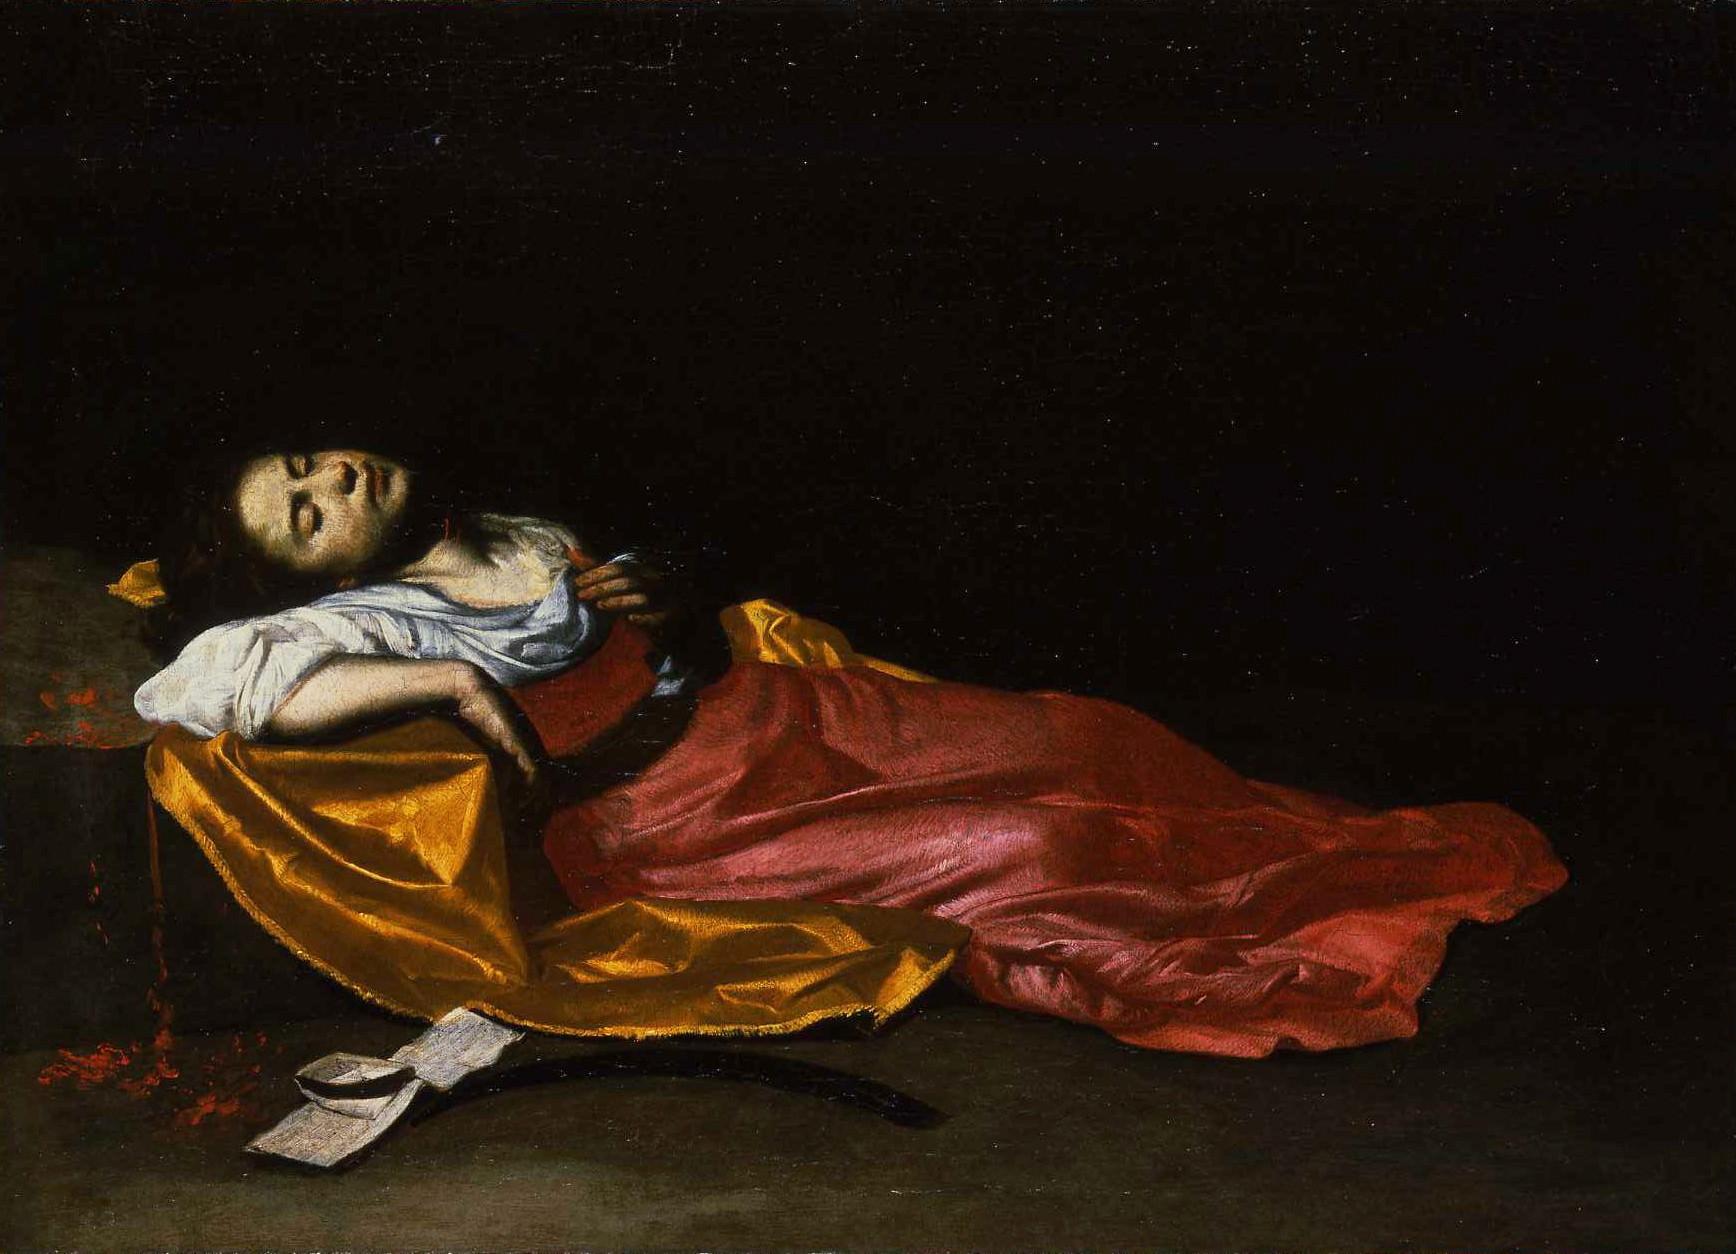 Francesco Guarino (1611 – 1651 / 1654). Martyrdom of Saint Cecilia, c. 1650, Museum of Grenoble